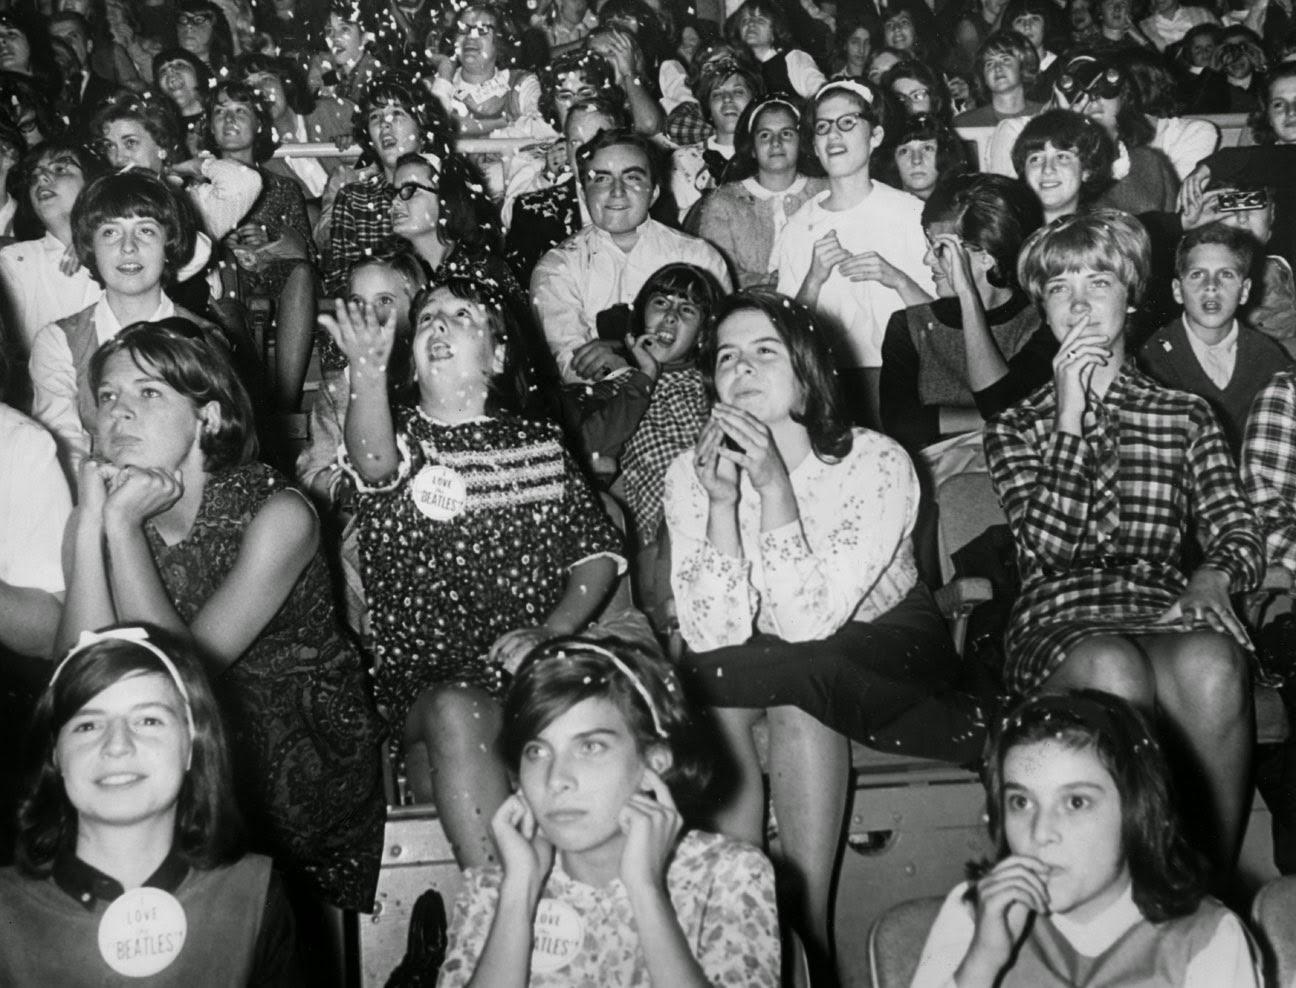 Resultado de imagen de the beatles concert 68 audience